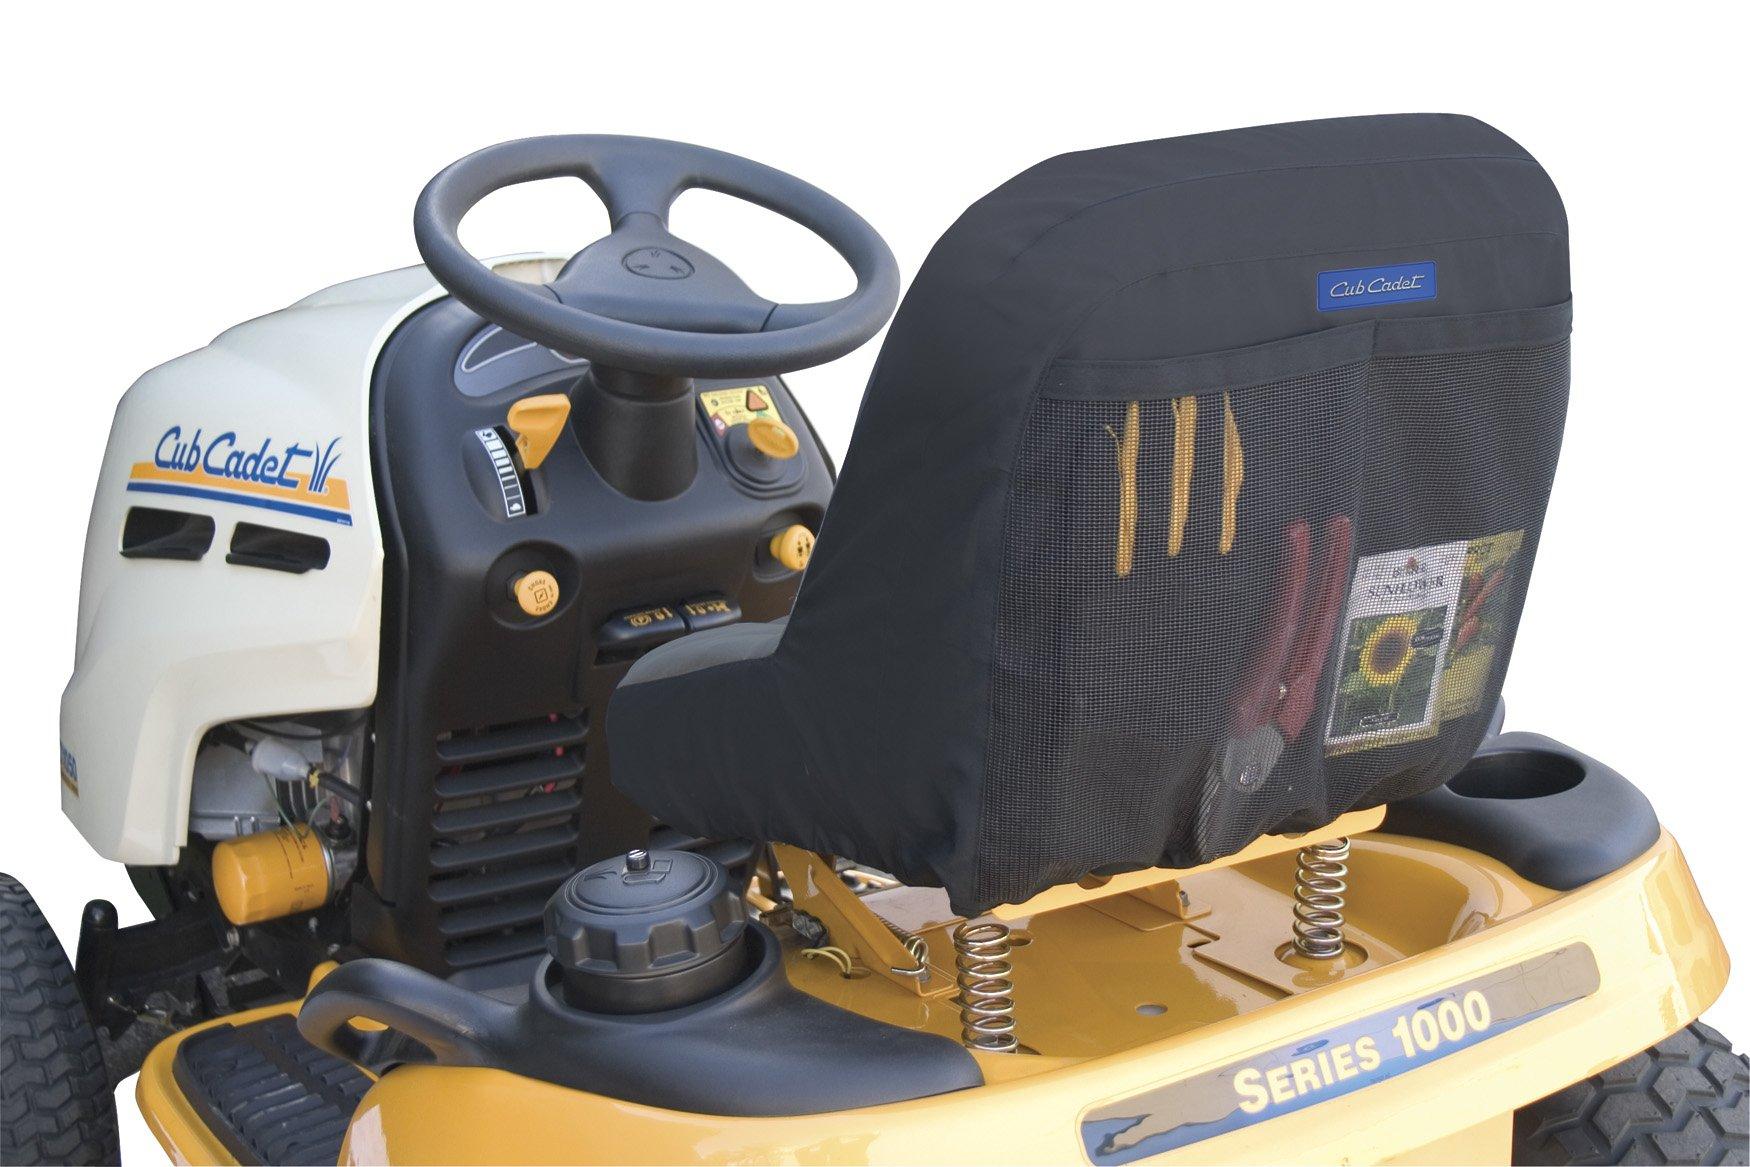 Cub Cadet 49233 Lawn Tractor Seat Cover, Size : Medium by CUB CADET